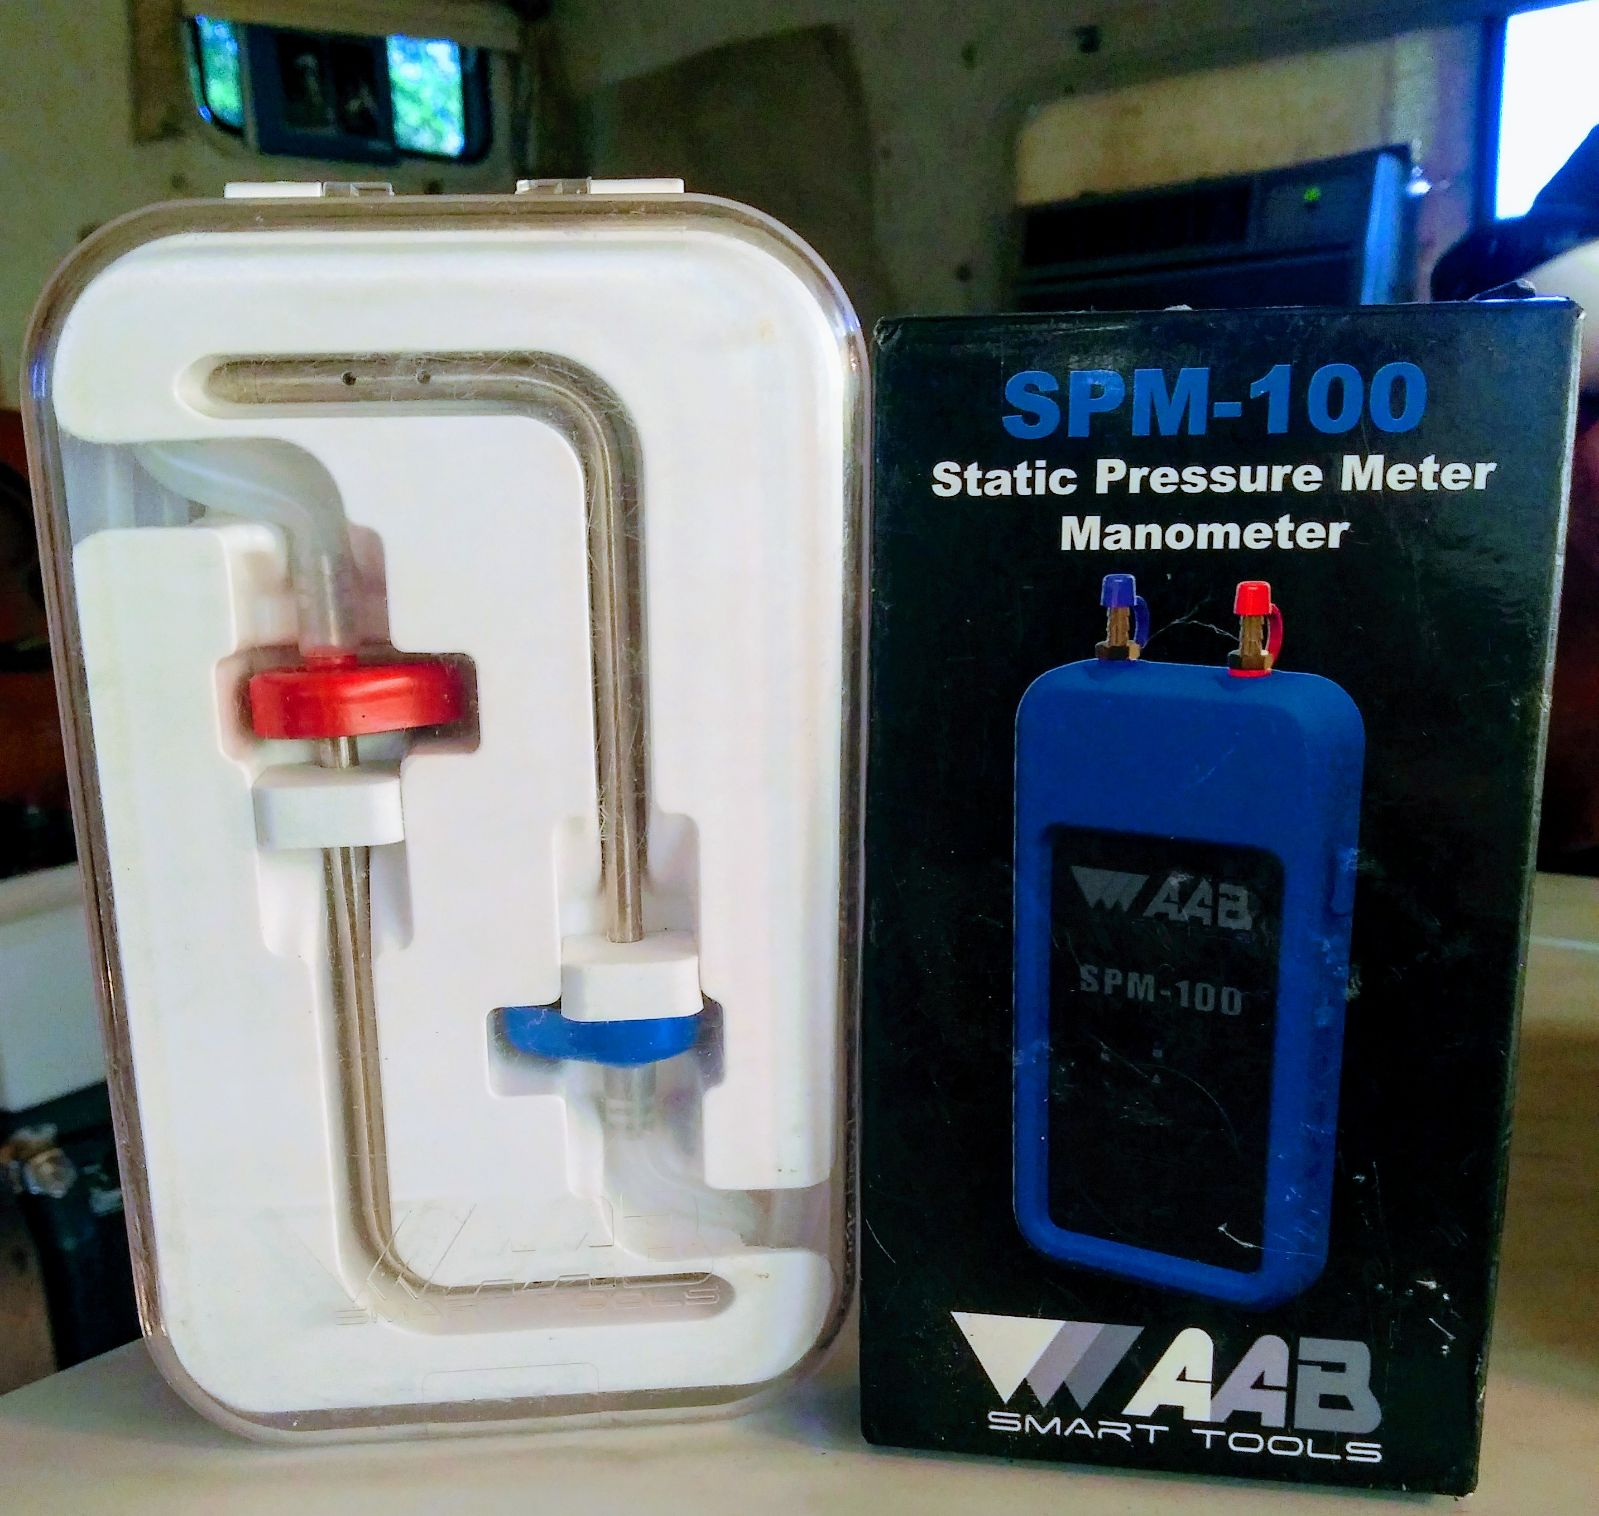 SPM-100 STATIC PRESSURE METER AND PROBE